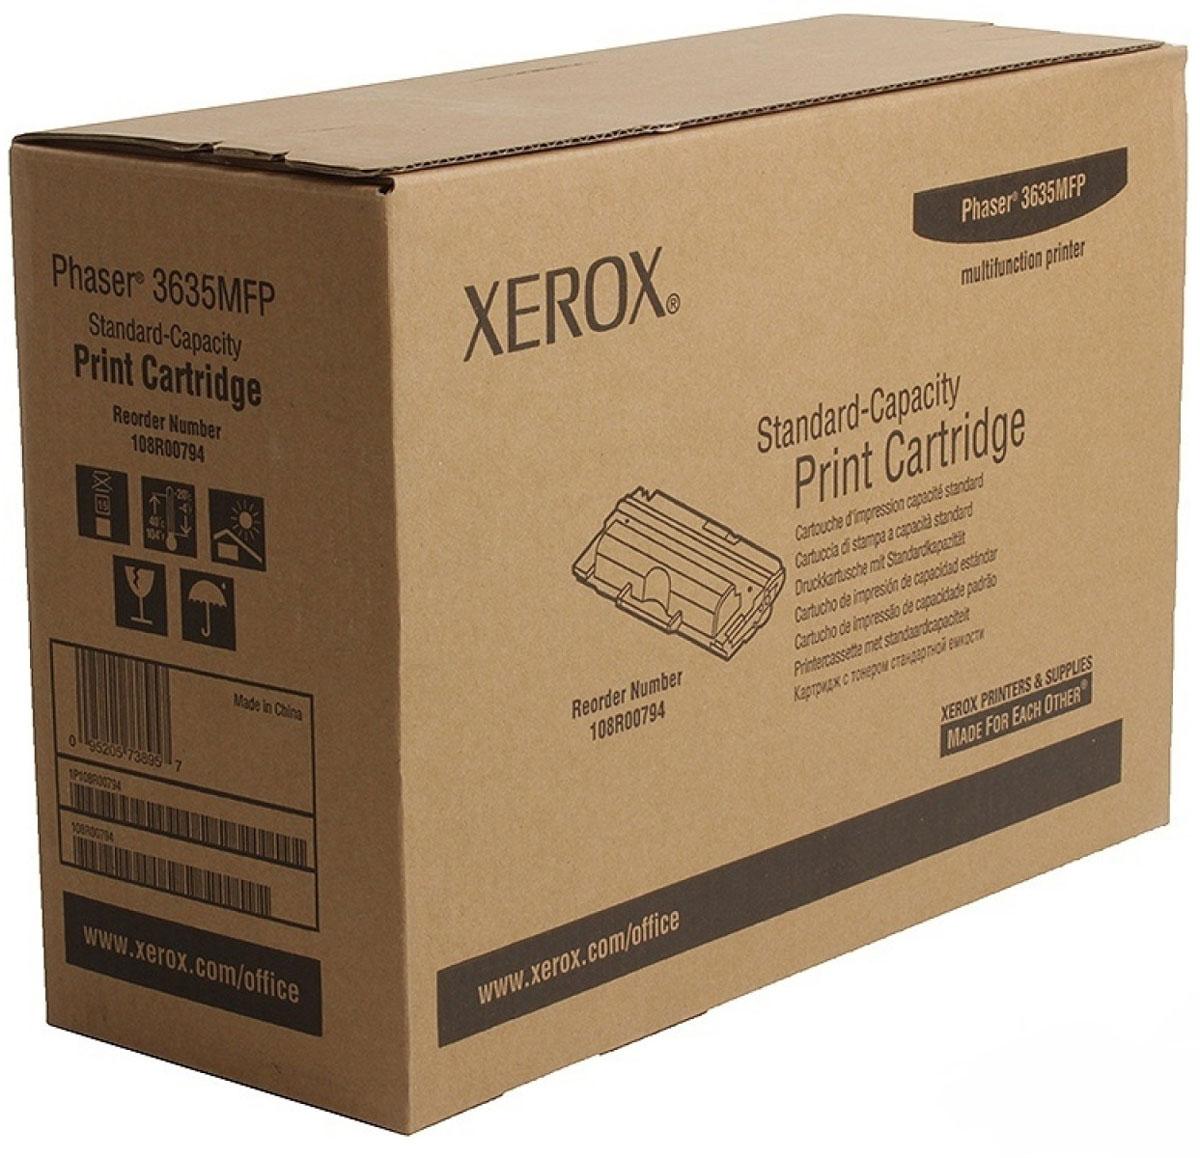 Xerox 108R00794, Black тонер-картридж для Xerox Phaser 3635MFP картридж xerox 106r01379